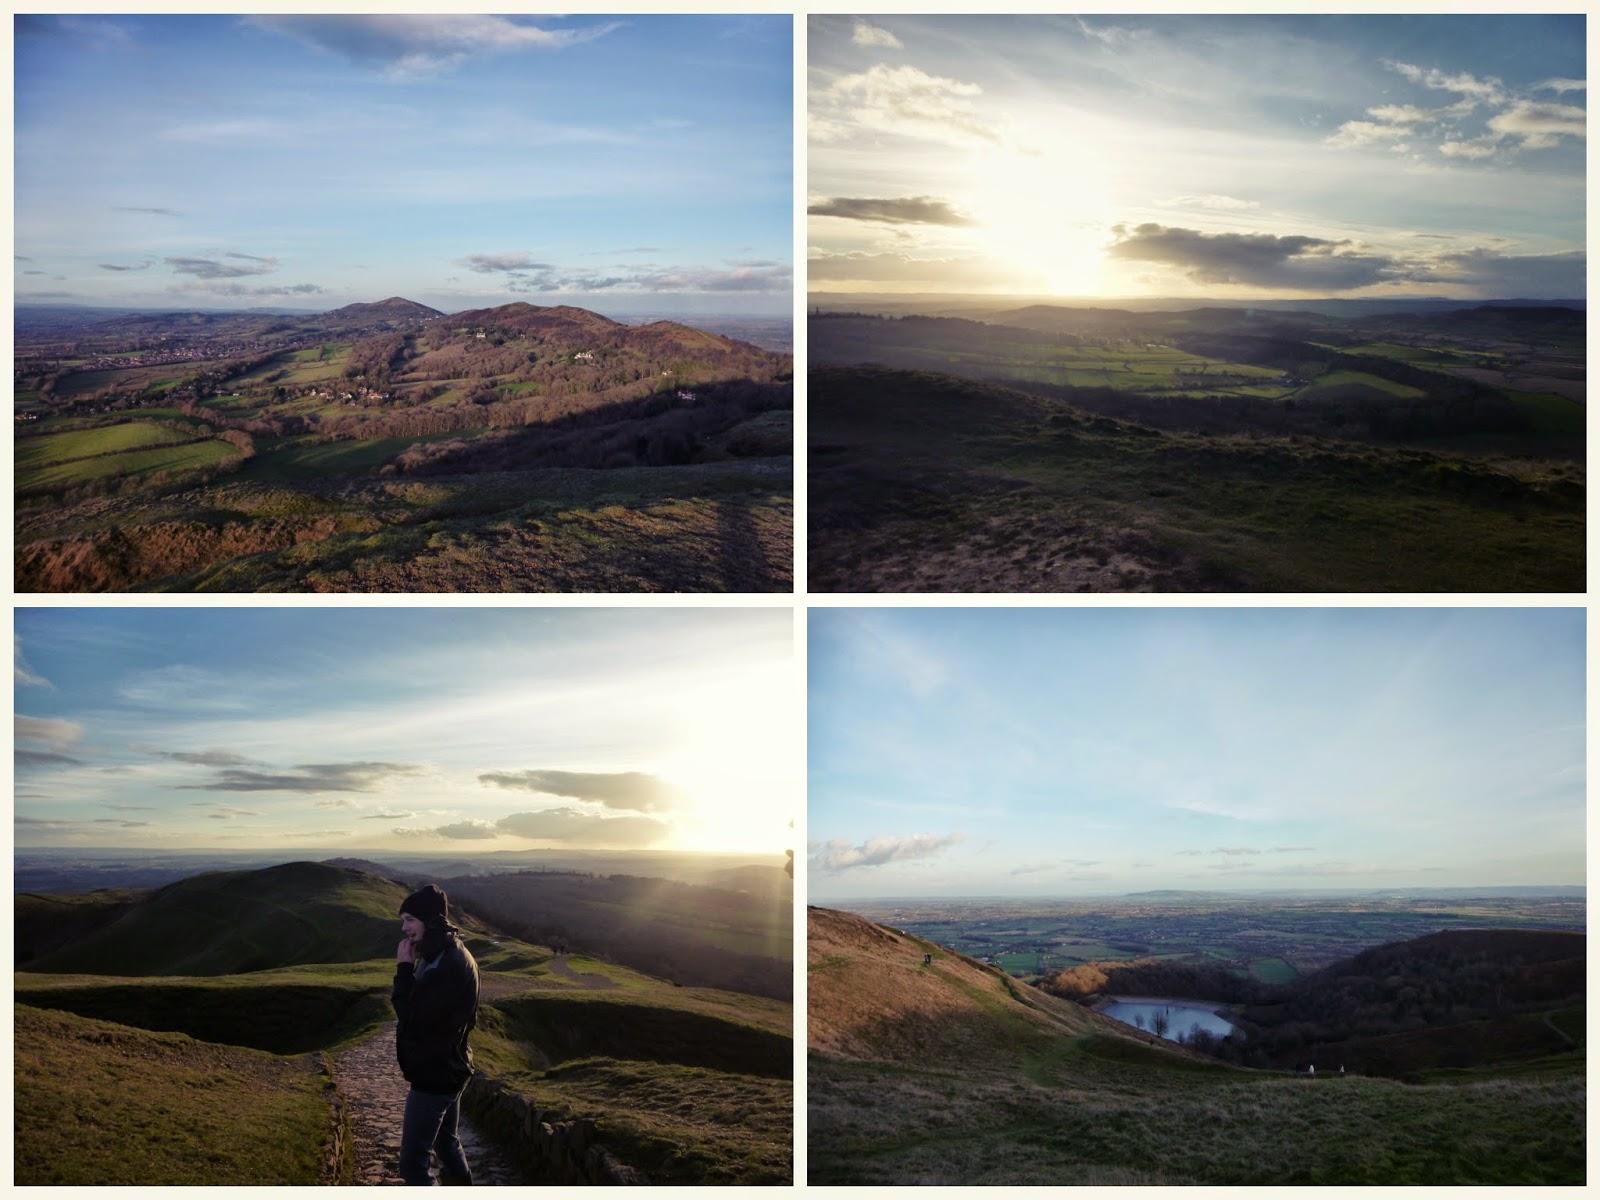 malvern hills england